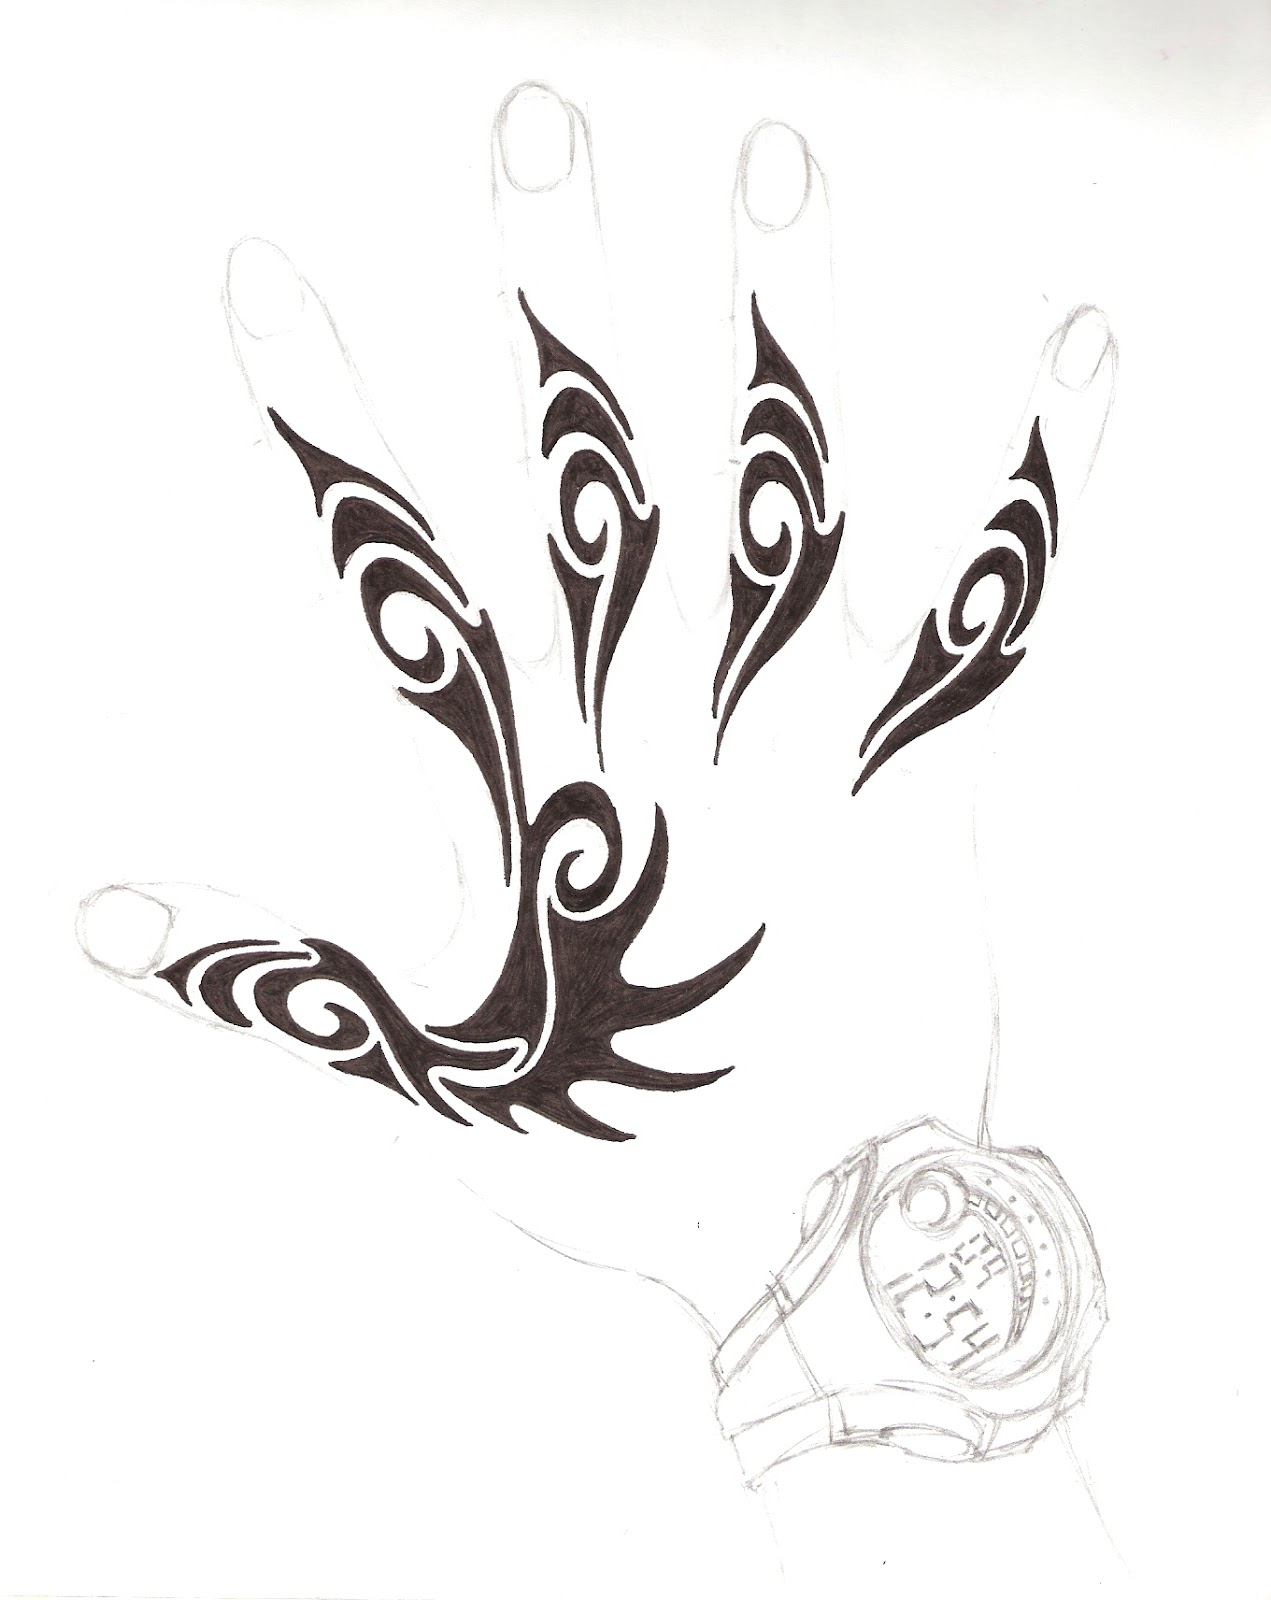 the black tattoos hand tattoos design. Black Bedroom Furniture Sets. Home Design Ideas